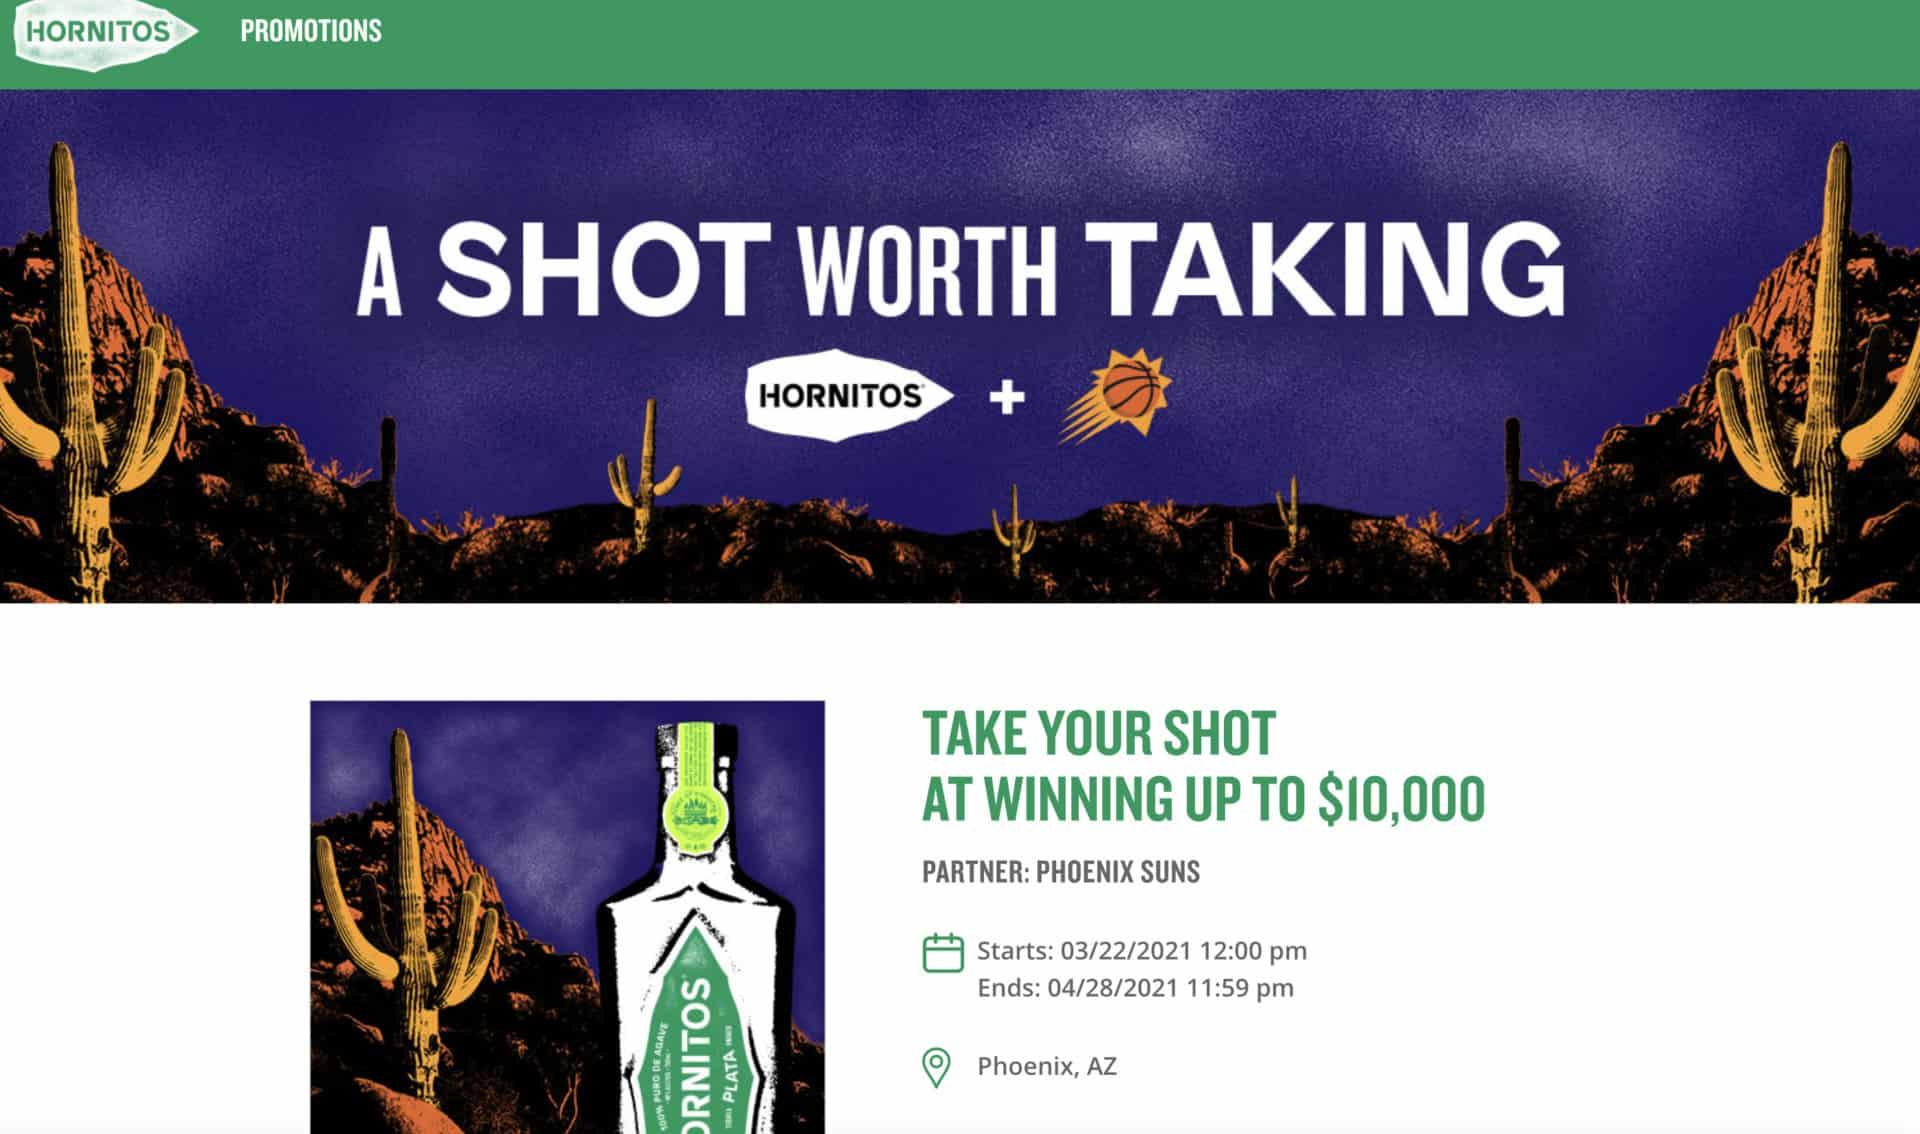 Hornitos Regional Promotion Platform